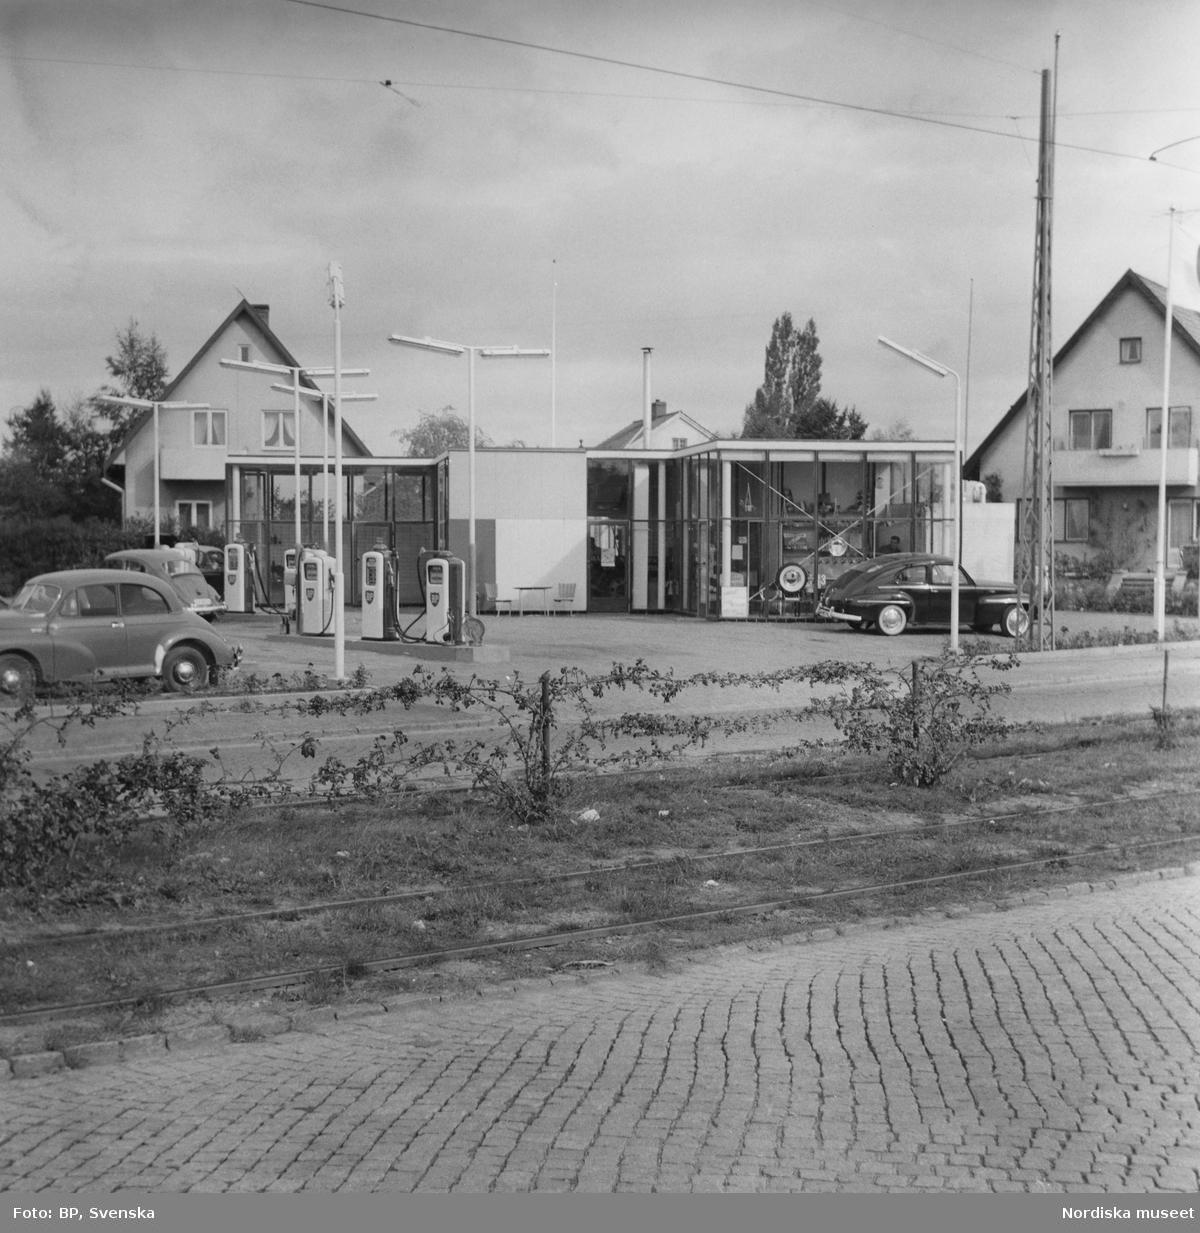 BP:s bensinstation på Linnégatan, Malmö.